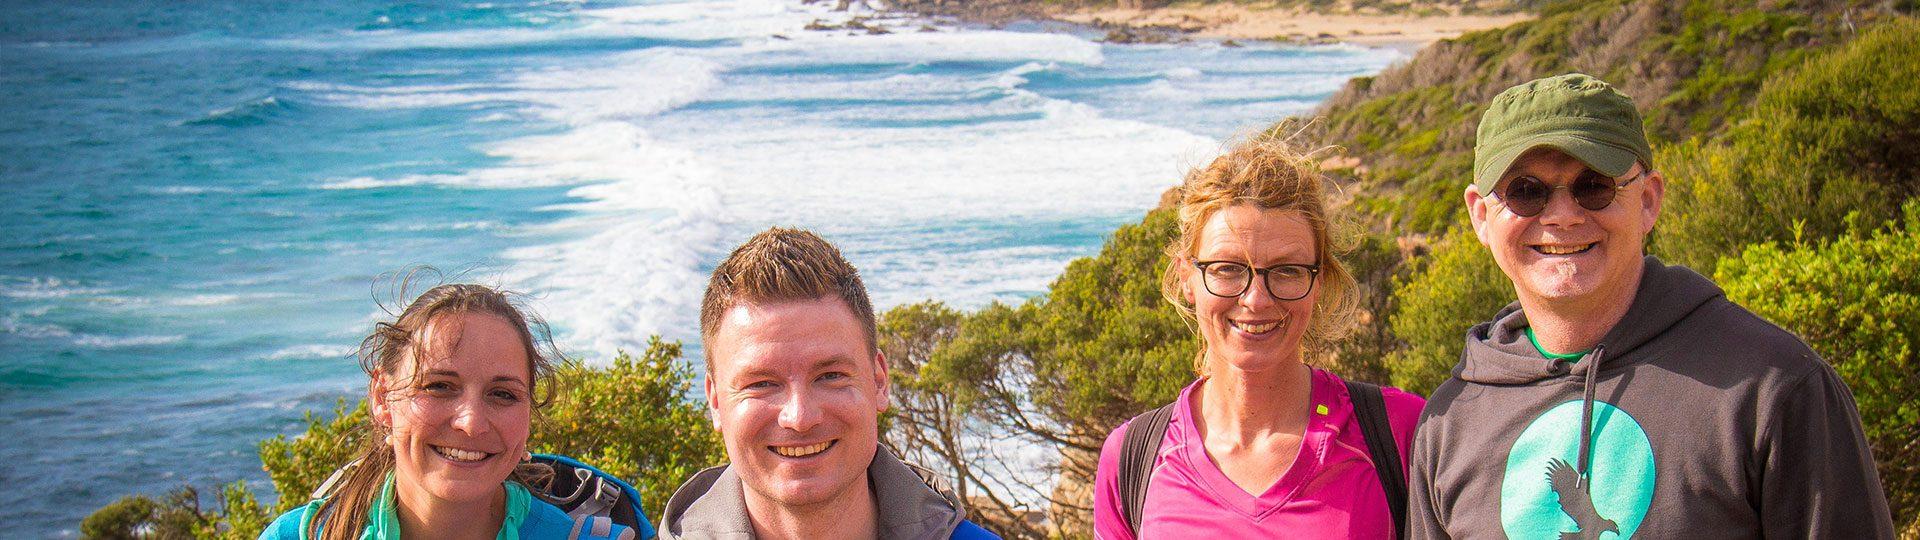 Guided Cape to Cape adventure